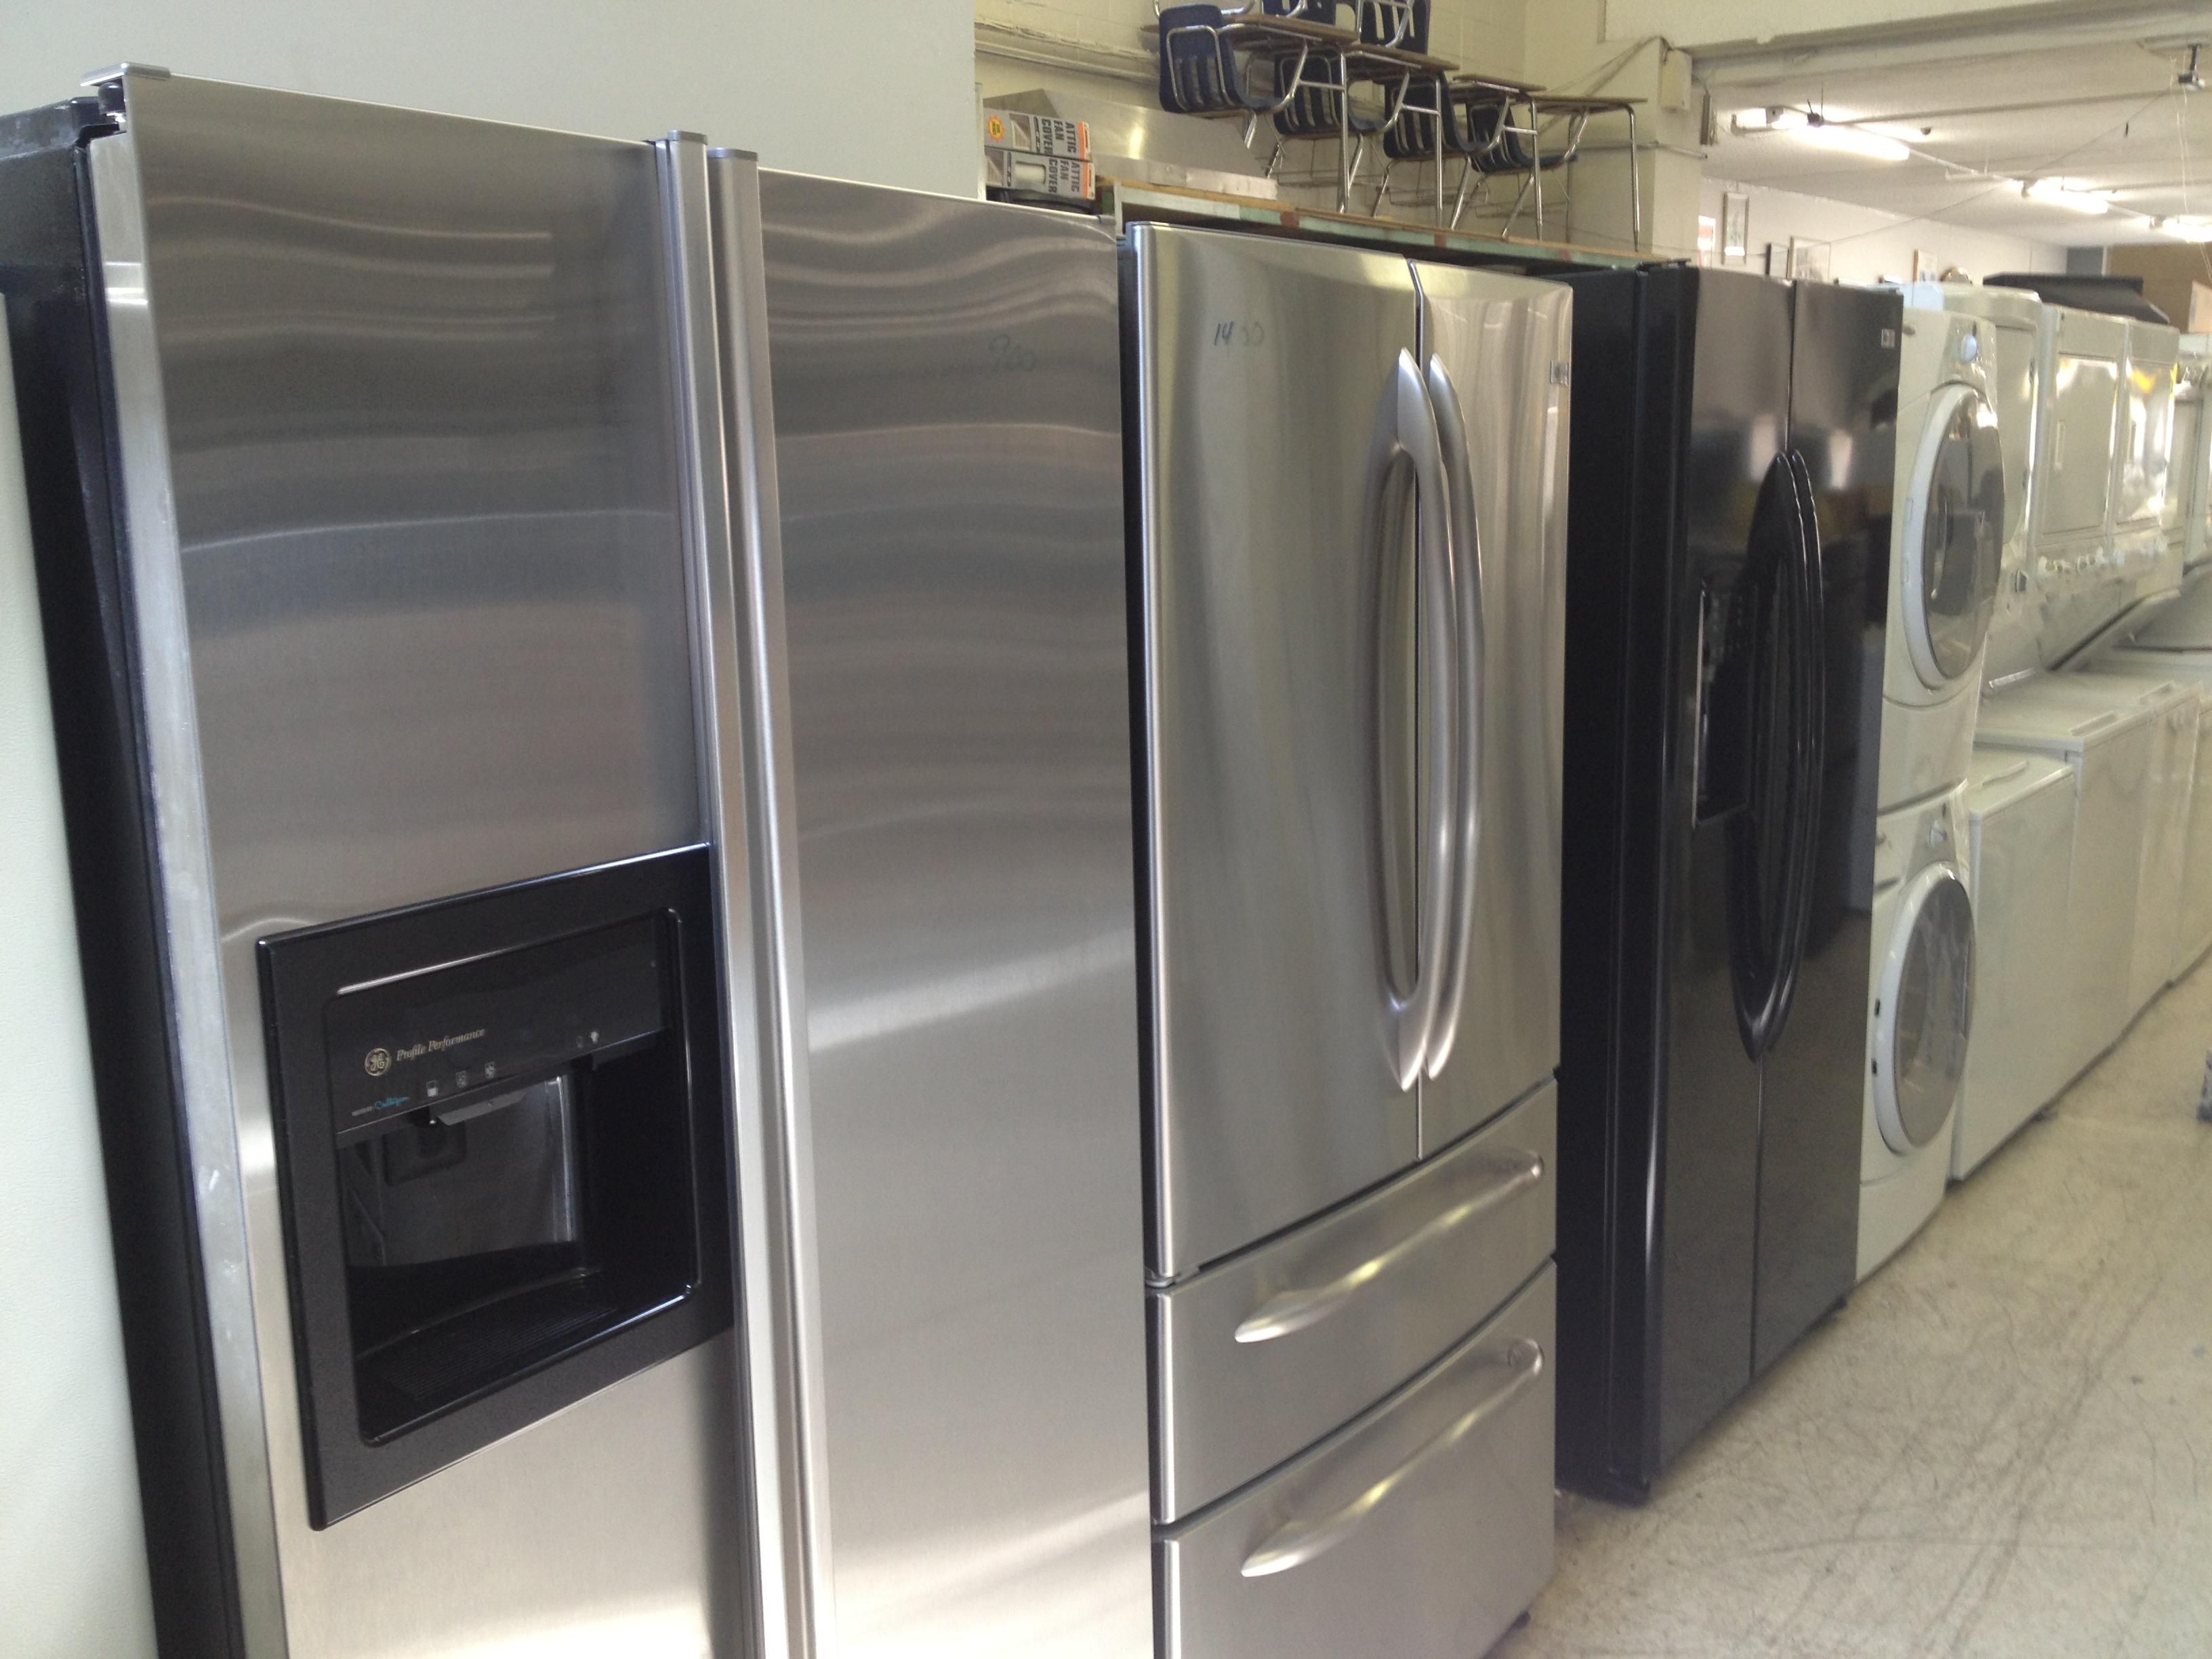 Van Nuys Appliances 6650 Van Nuys Blvd Van Nuys CA YP